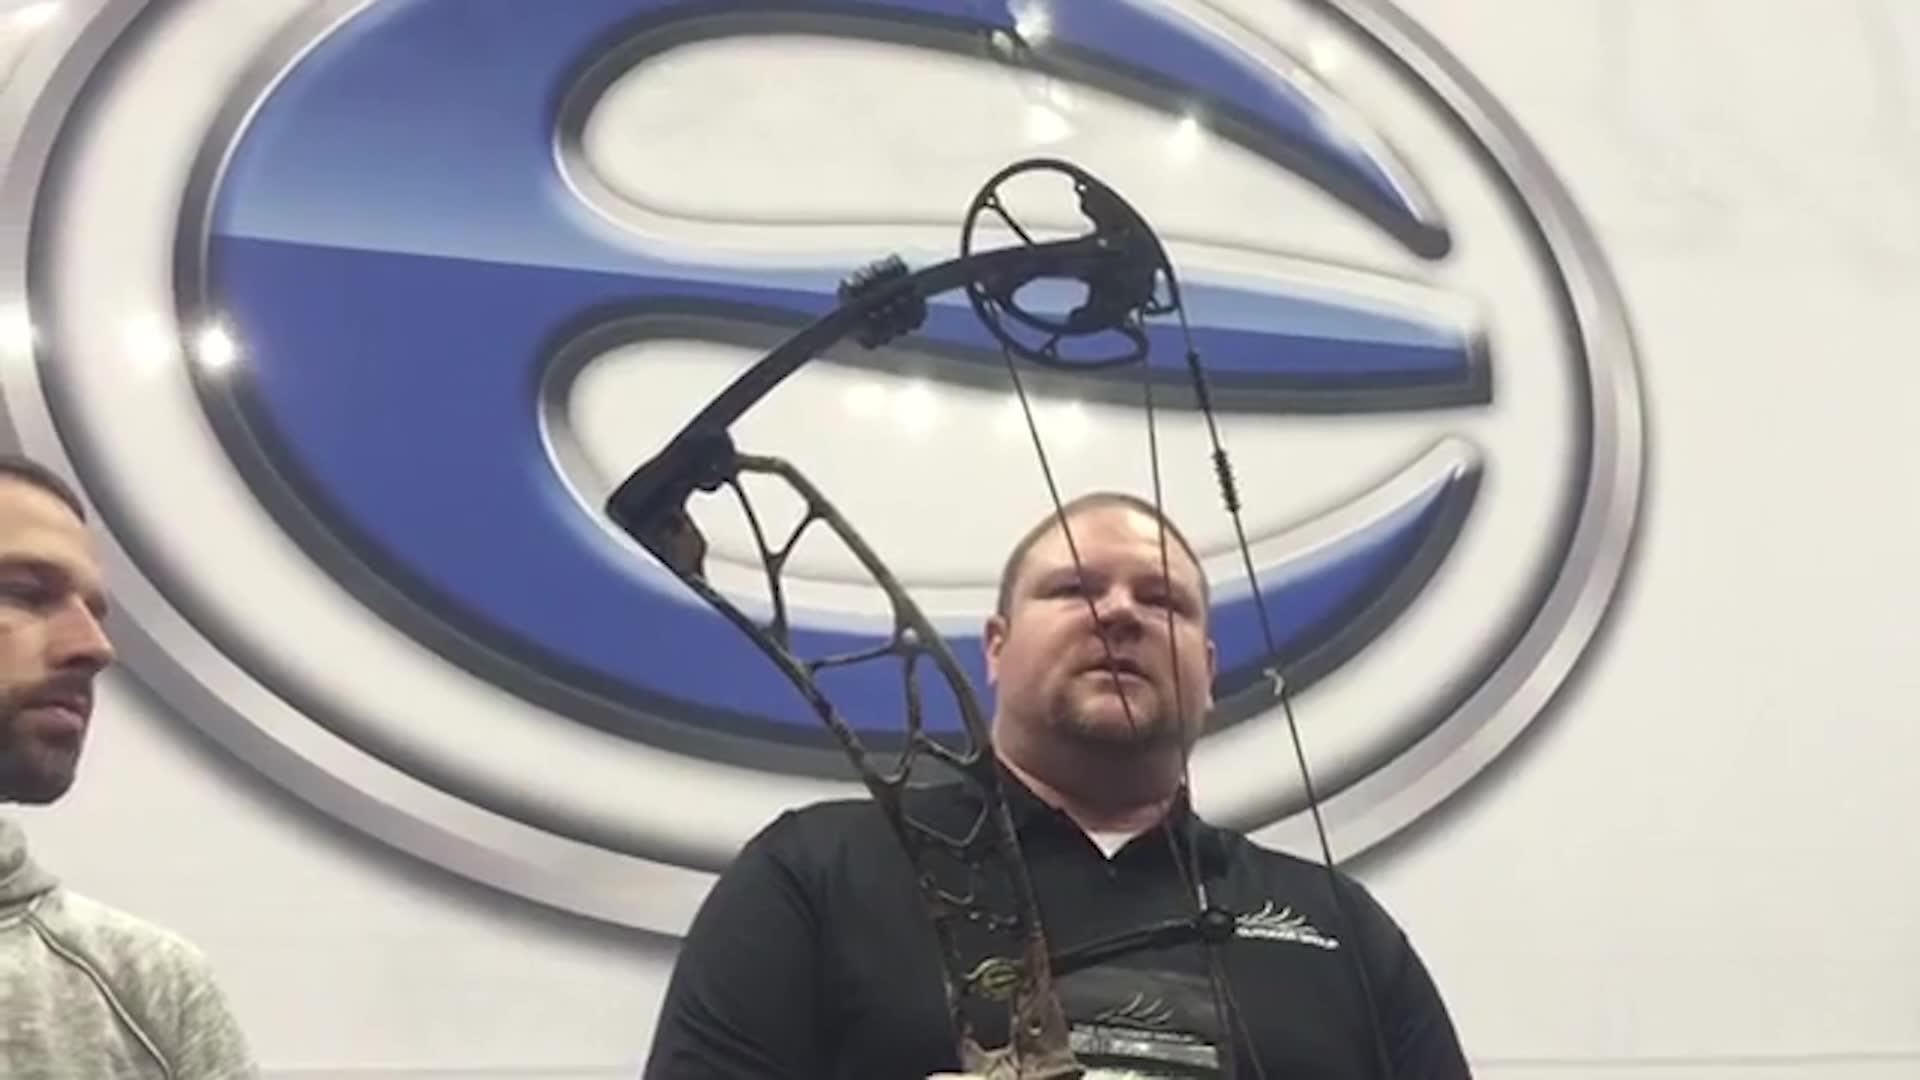 ATA - Archery Trade Association - Elite Archery